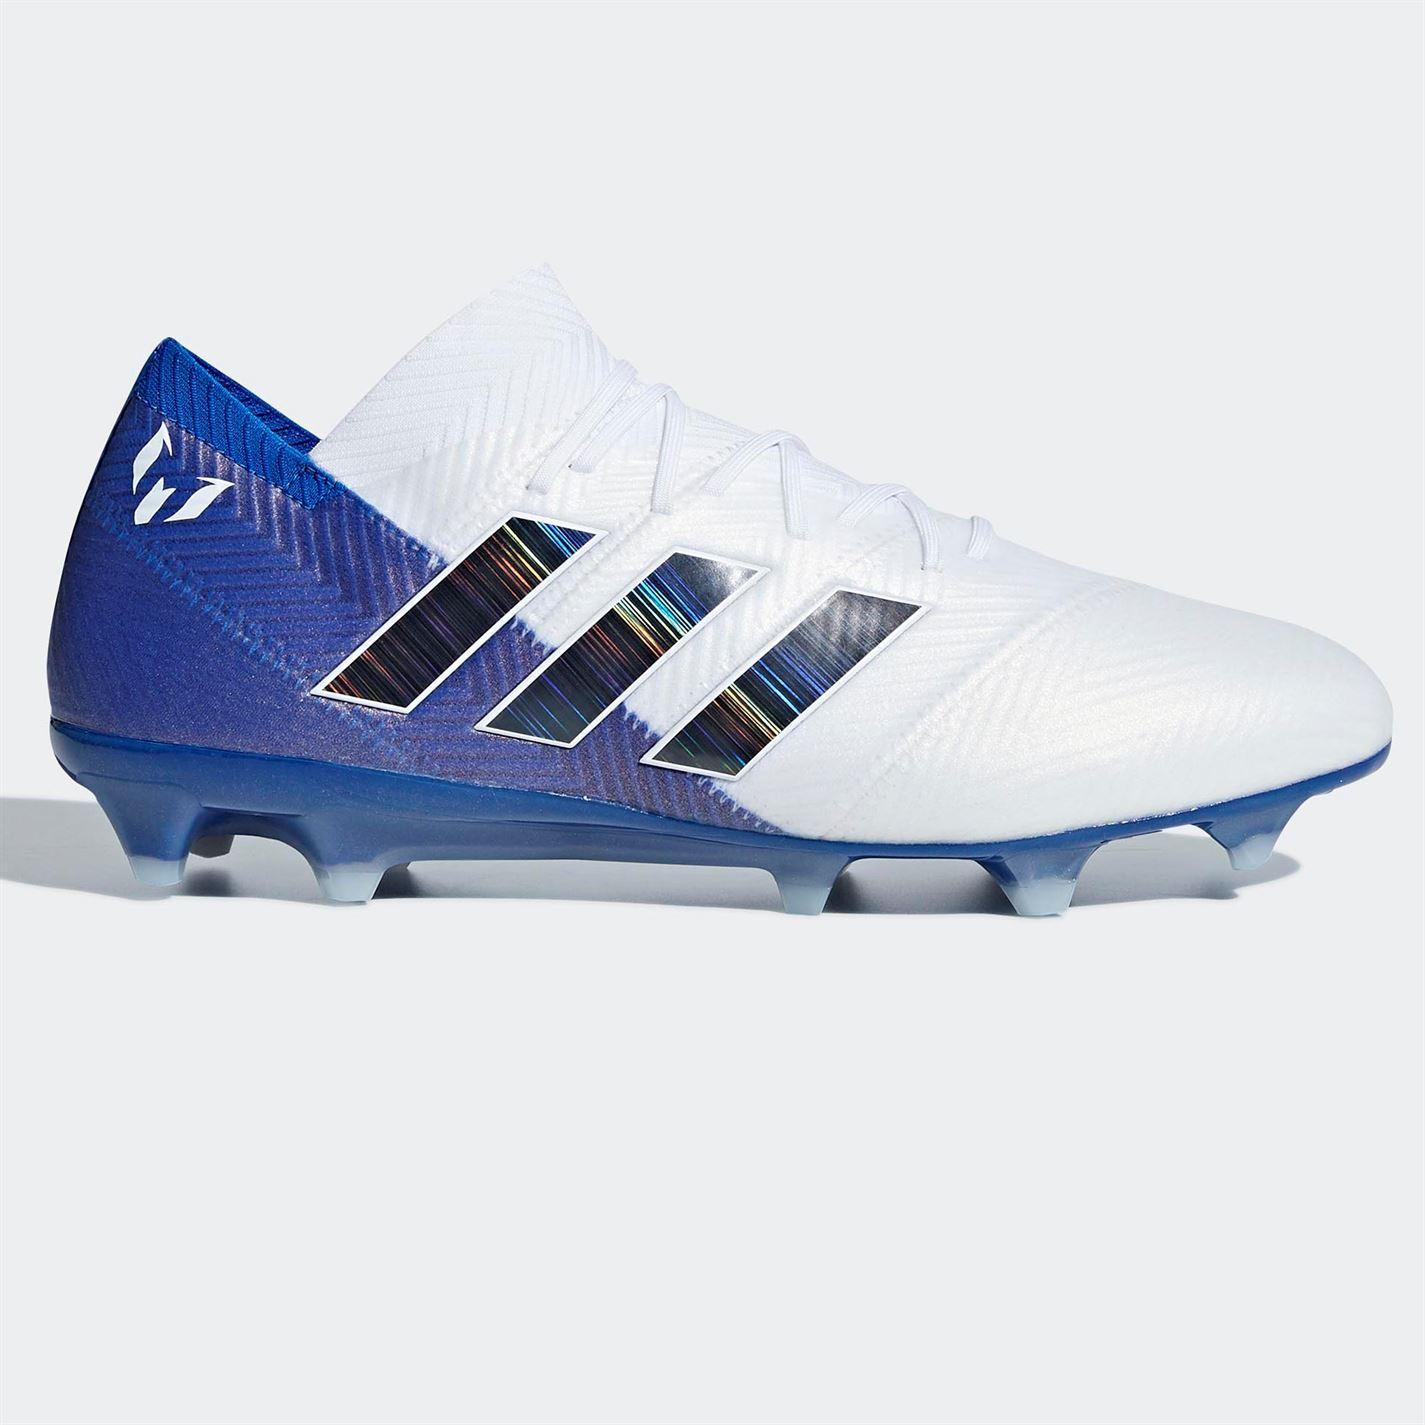 reputable site b2a39 8eaa0 ... cheap adidas homme nemeziz nemeziz nemeziz messi 18.1 fg football  bottes firm ground lace up lightweight